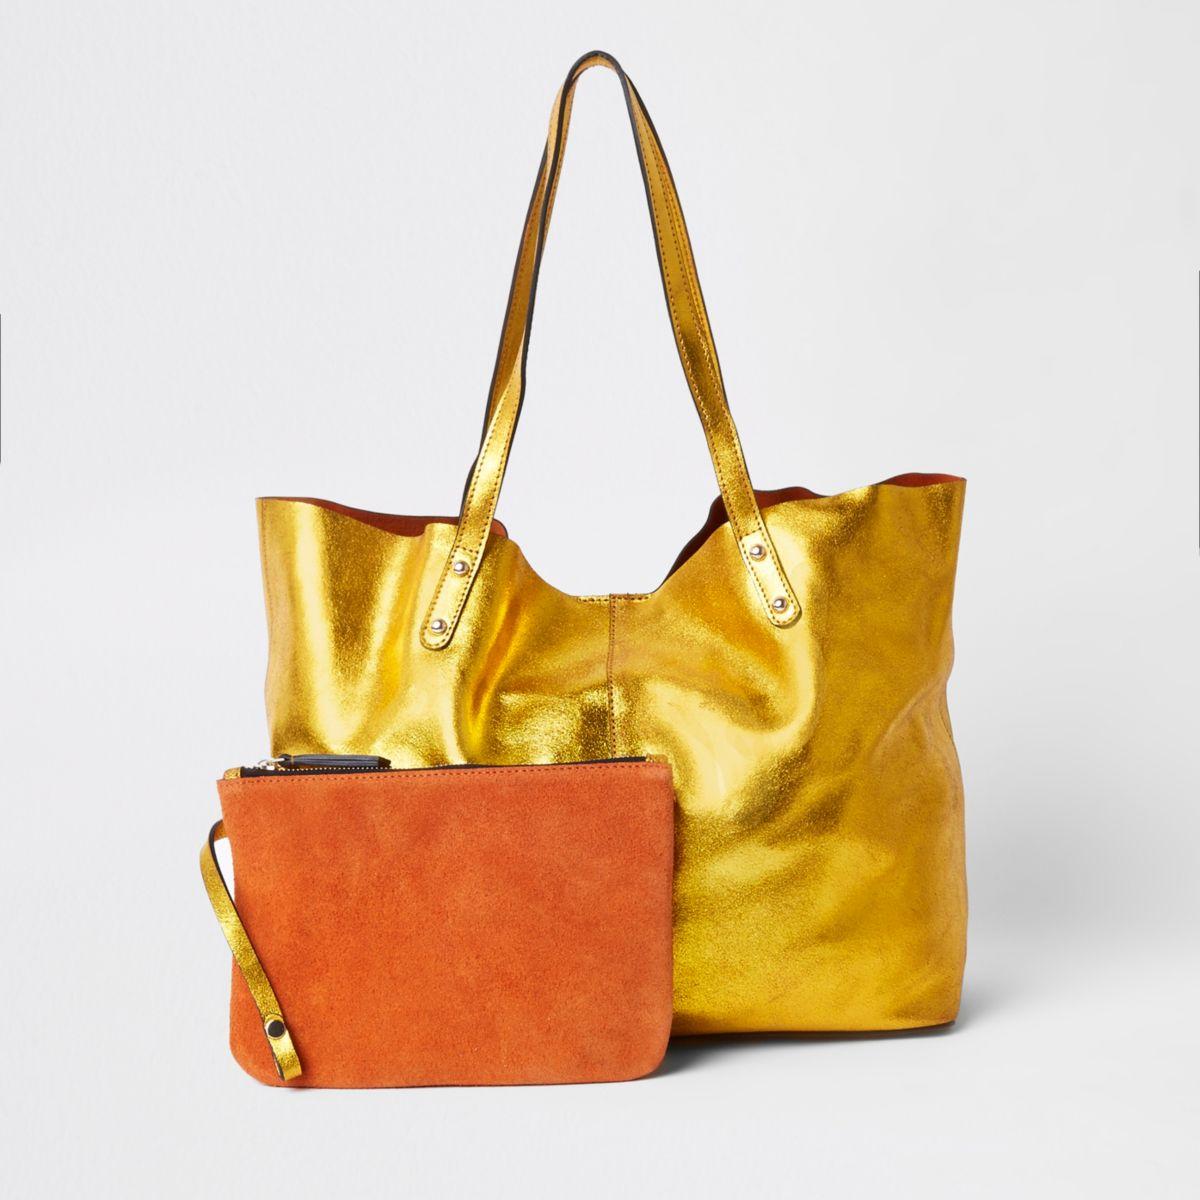 Gold leather metallic shopper tote bag